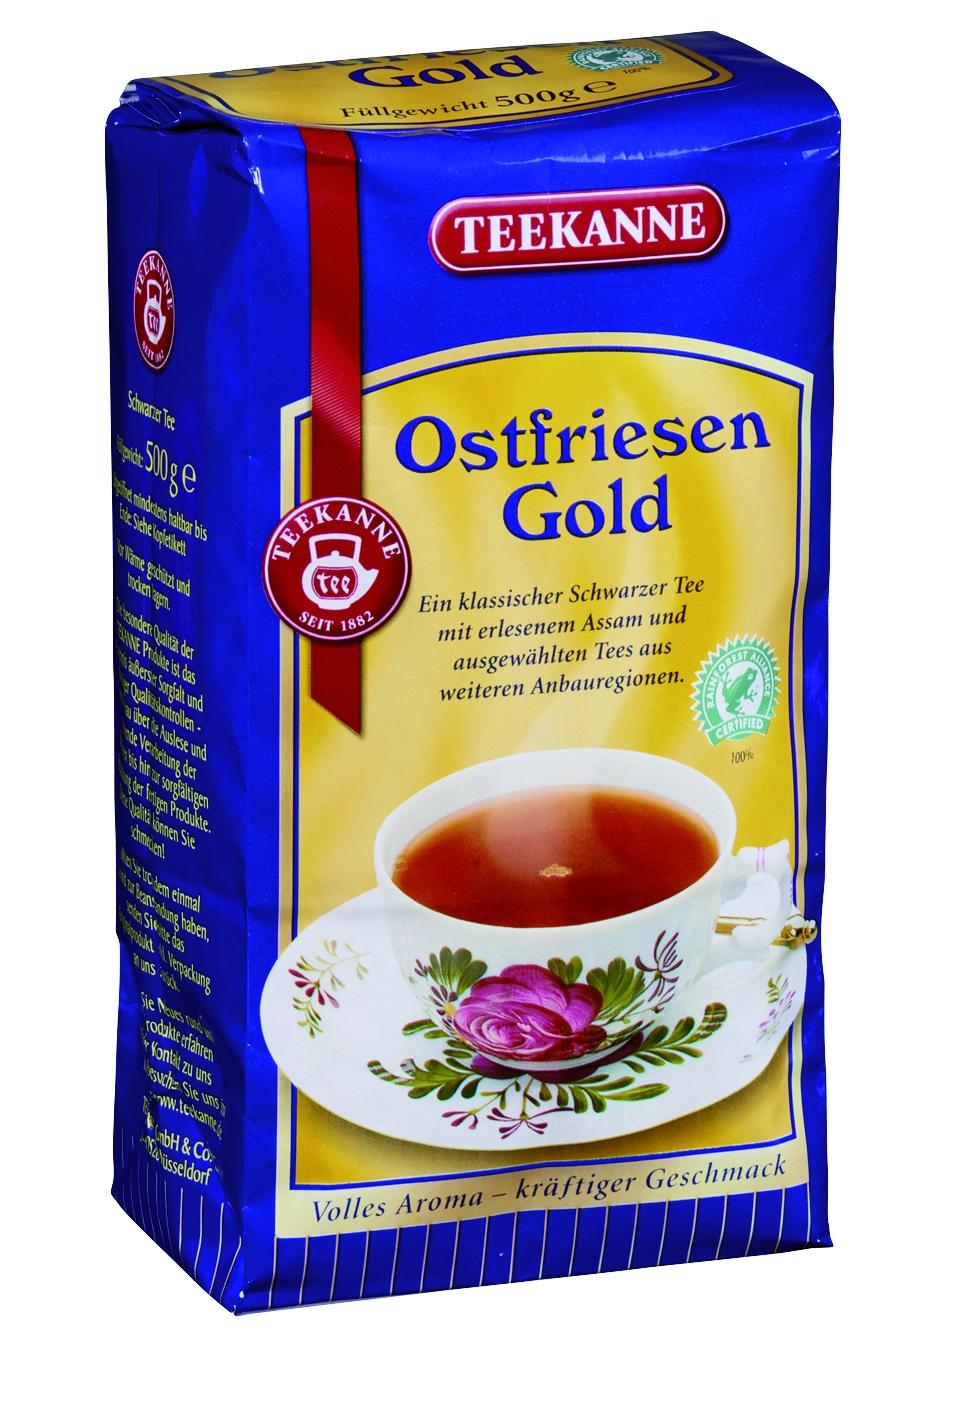 Ostfriesen Gold